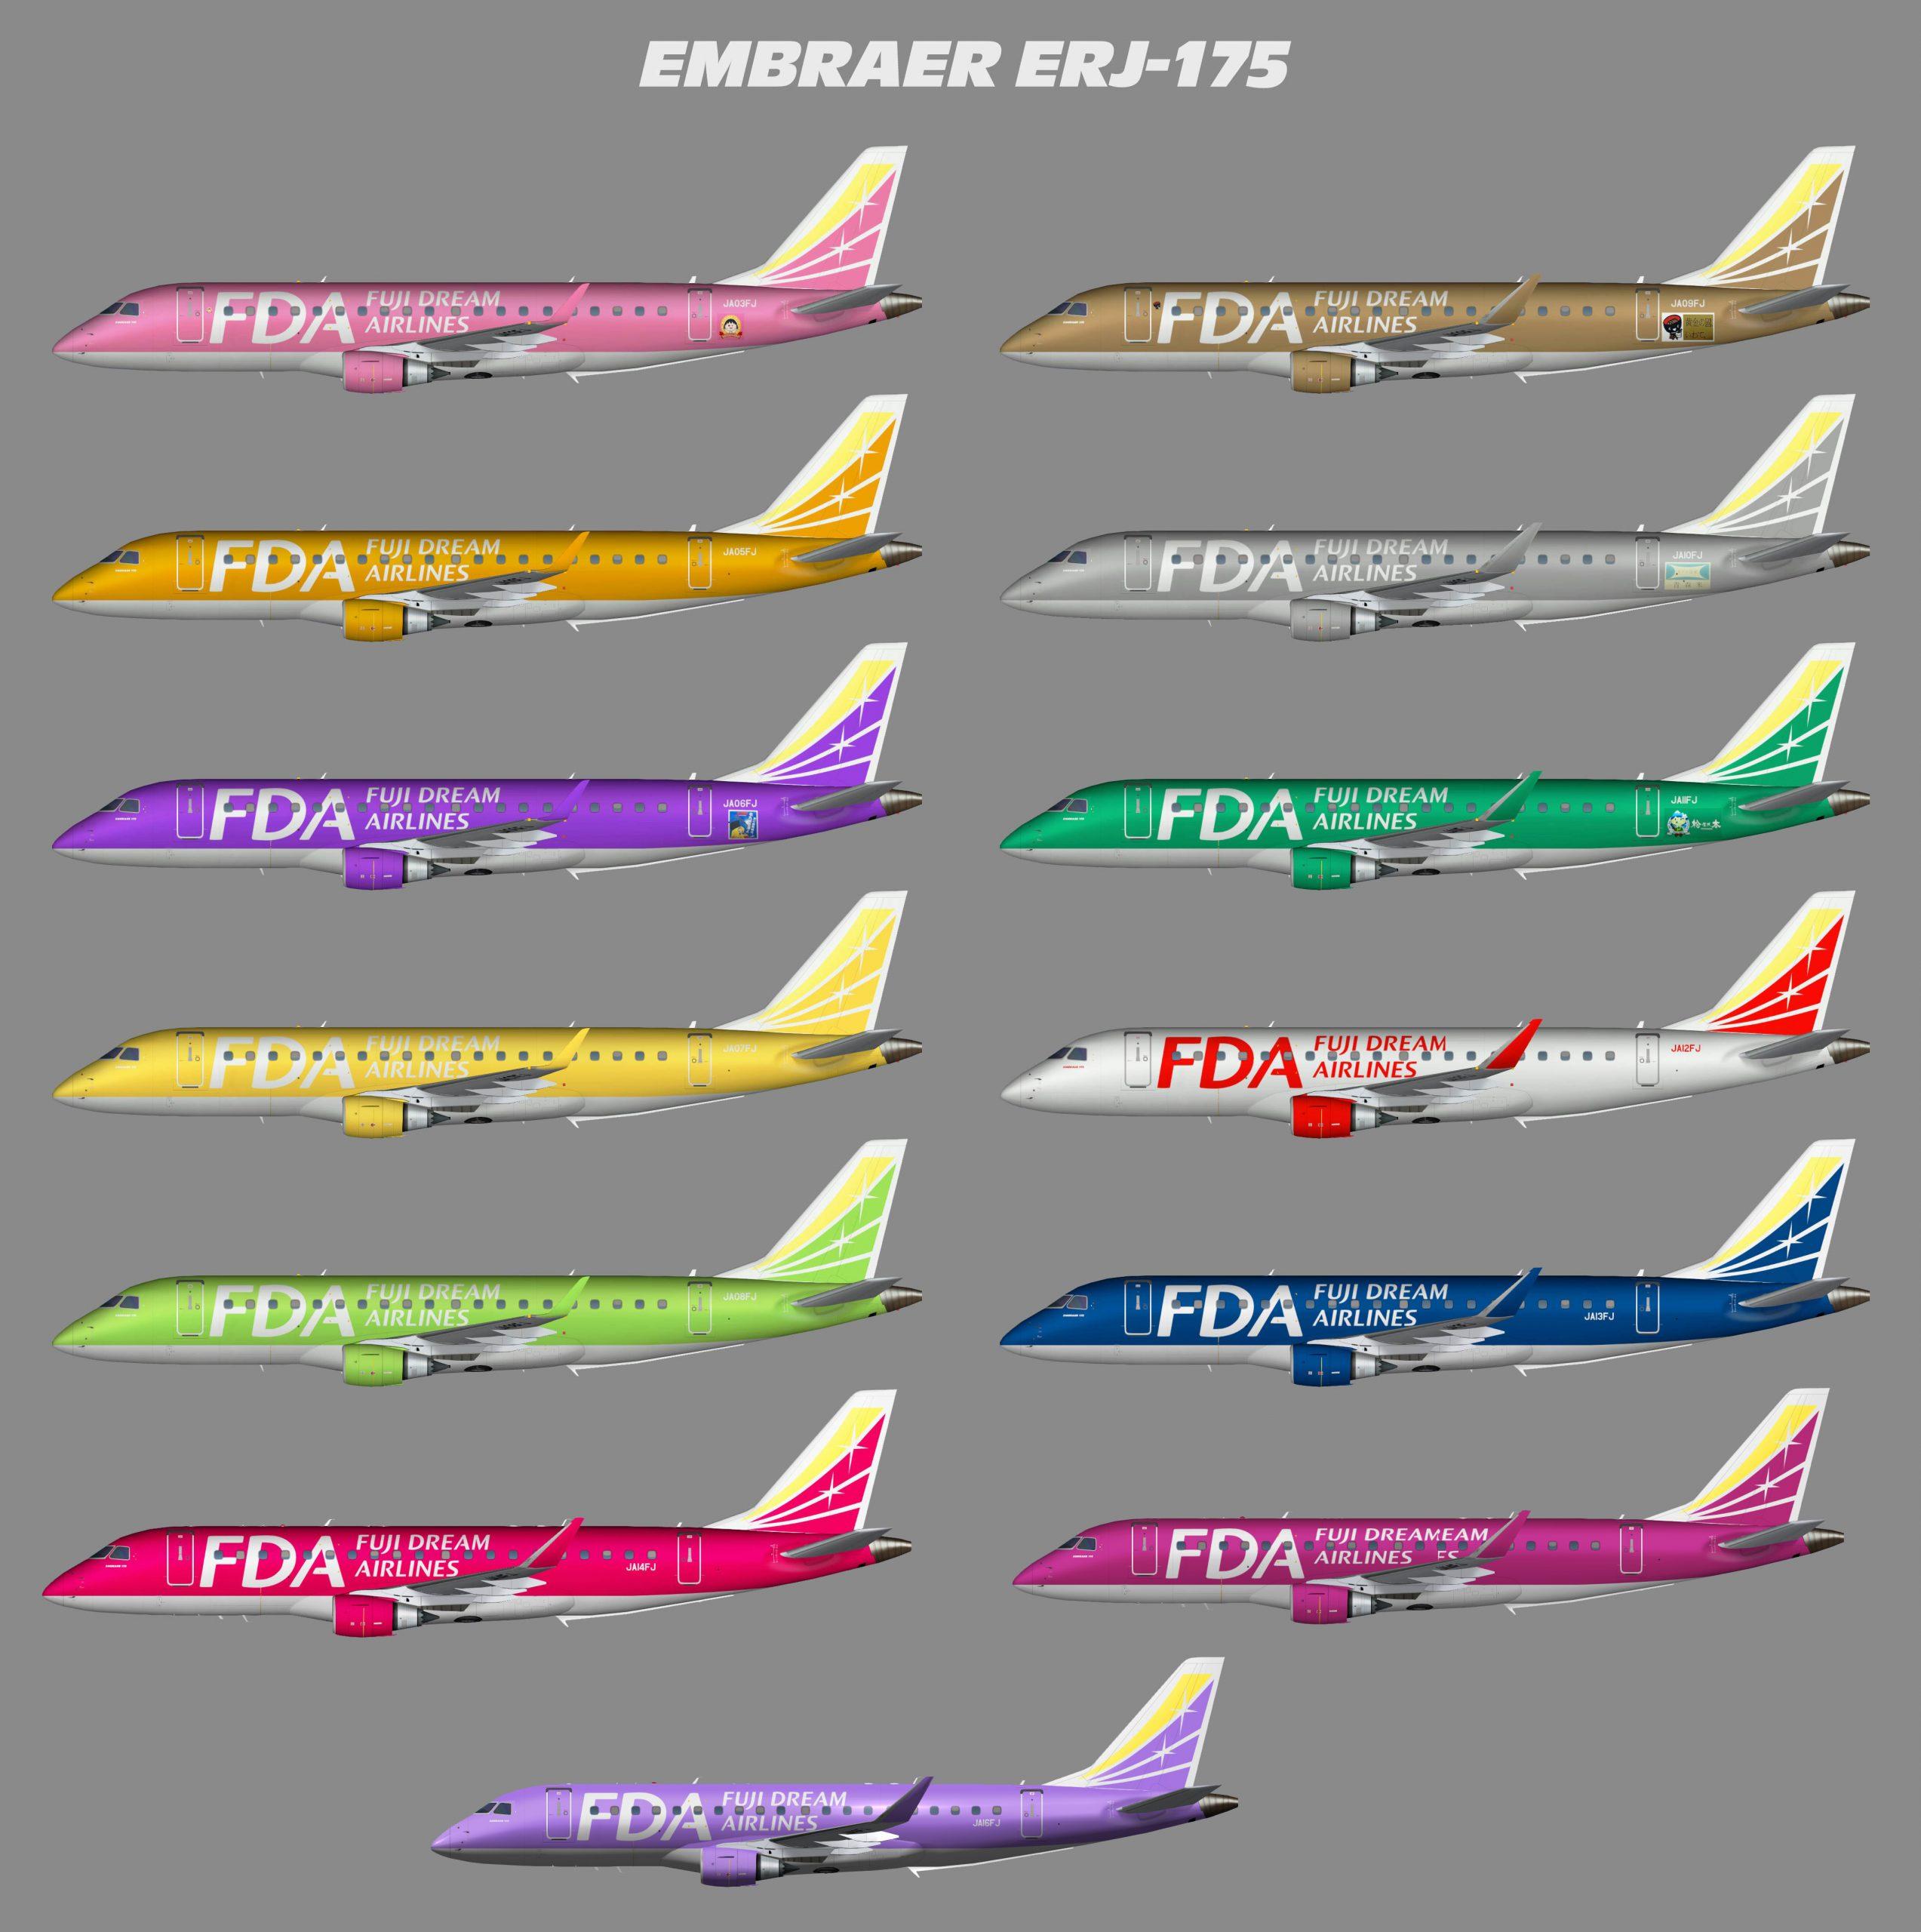 Embraer  ERJ-175 Fuji Dream Airlines